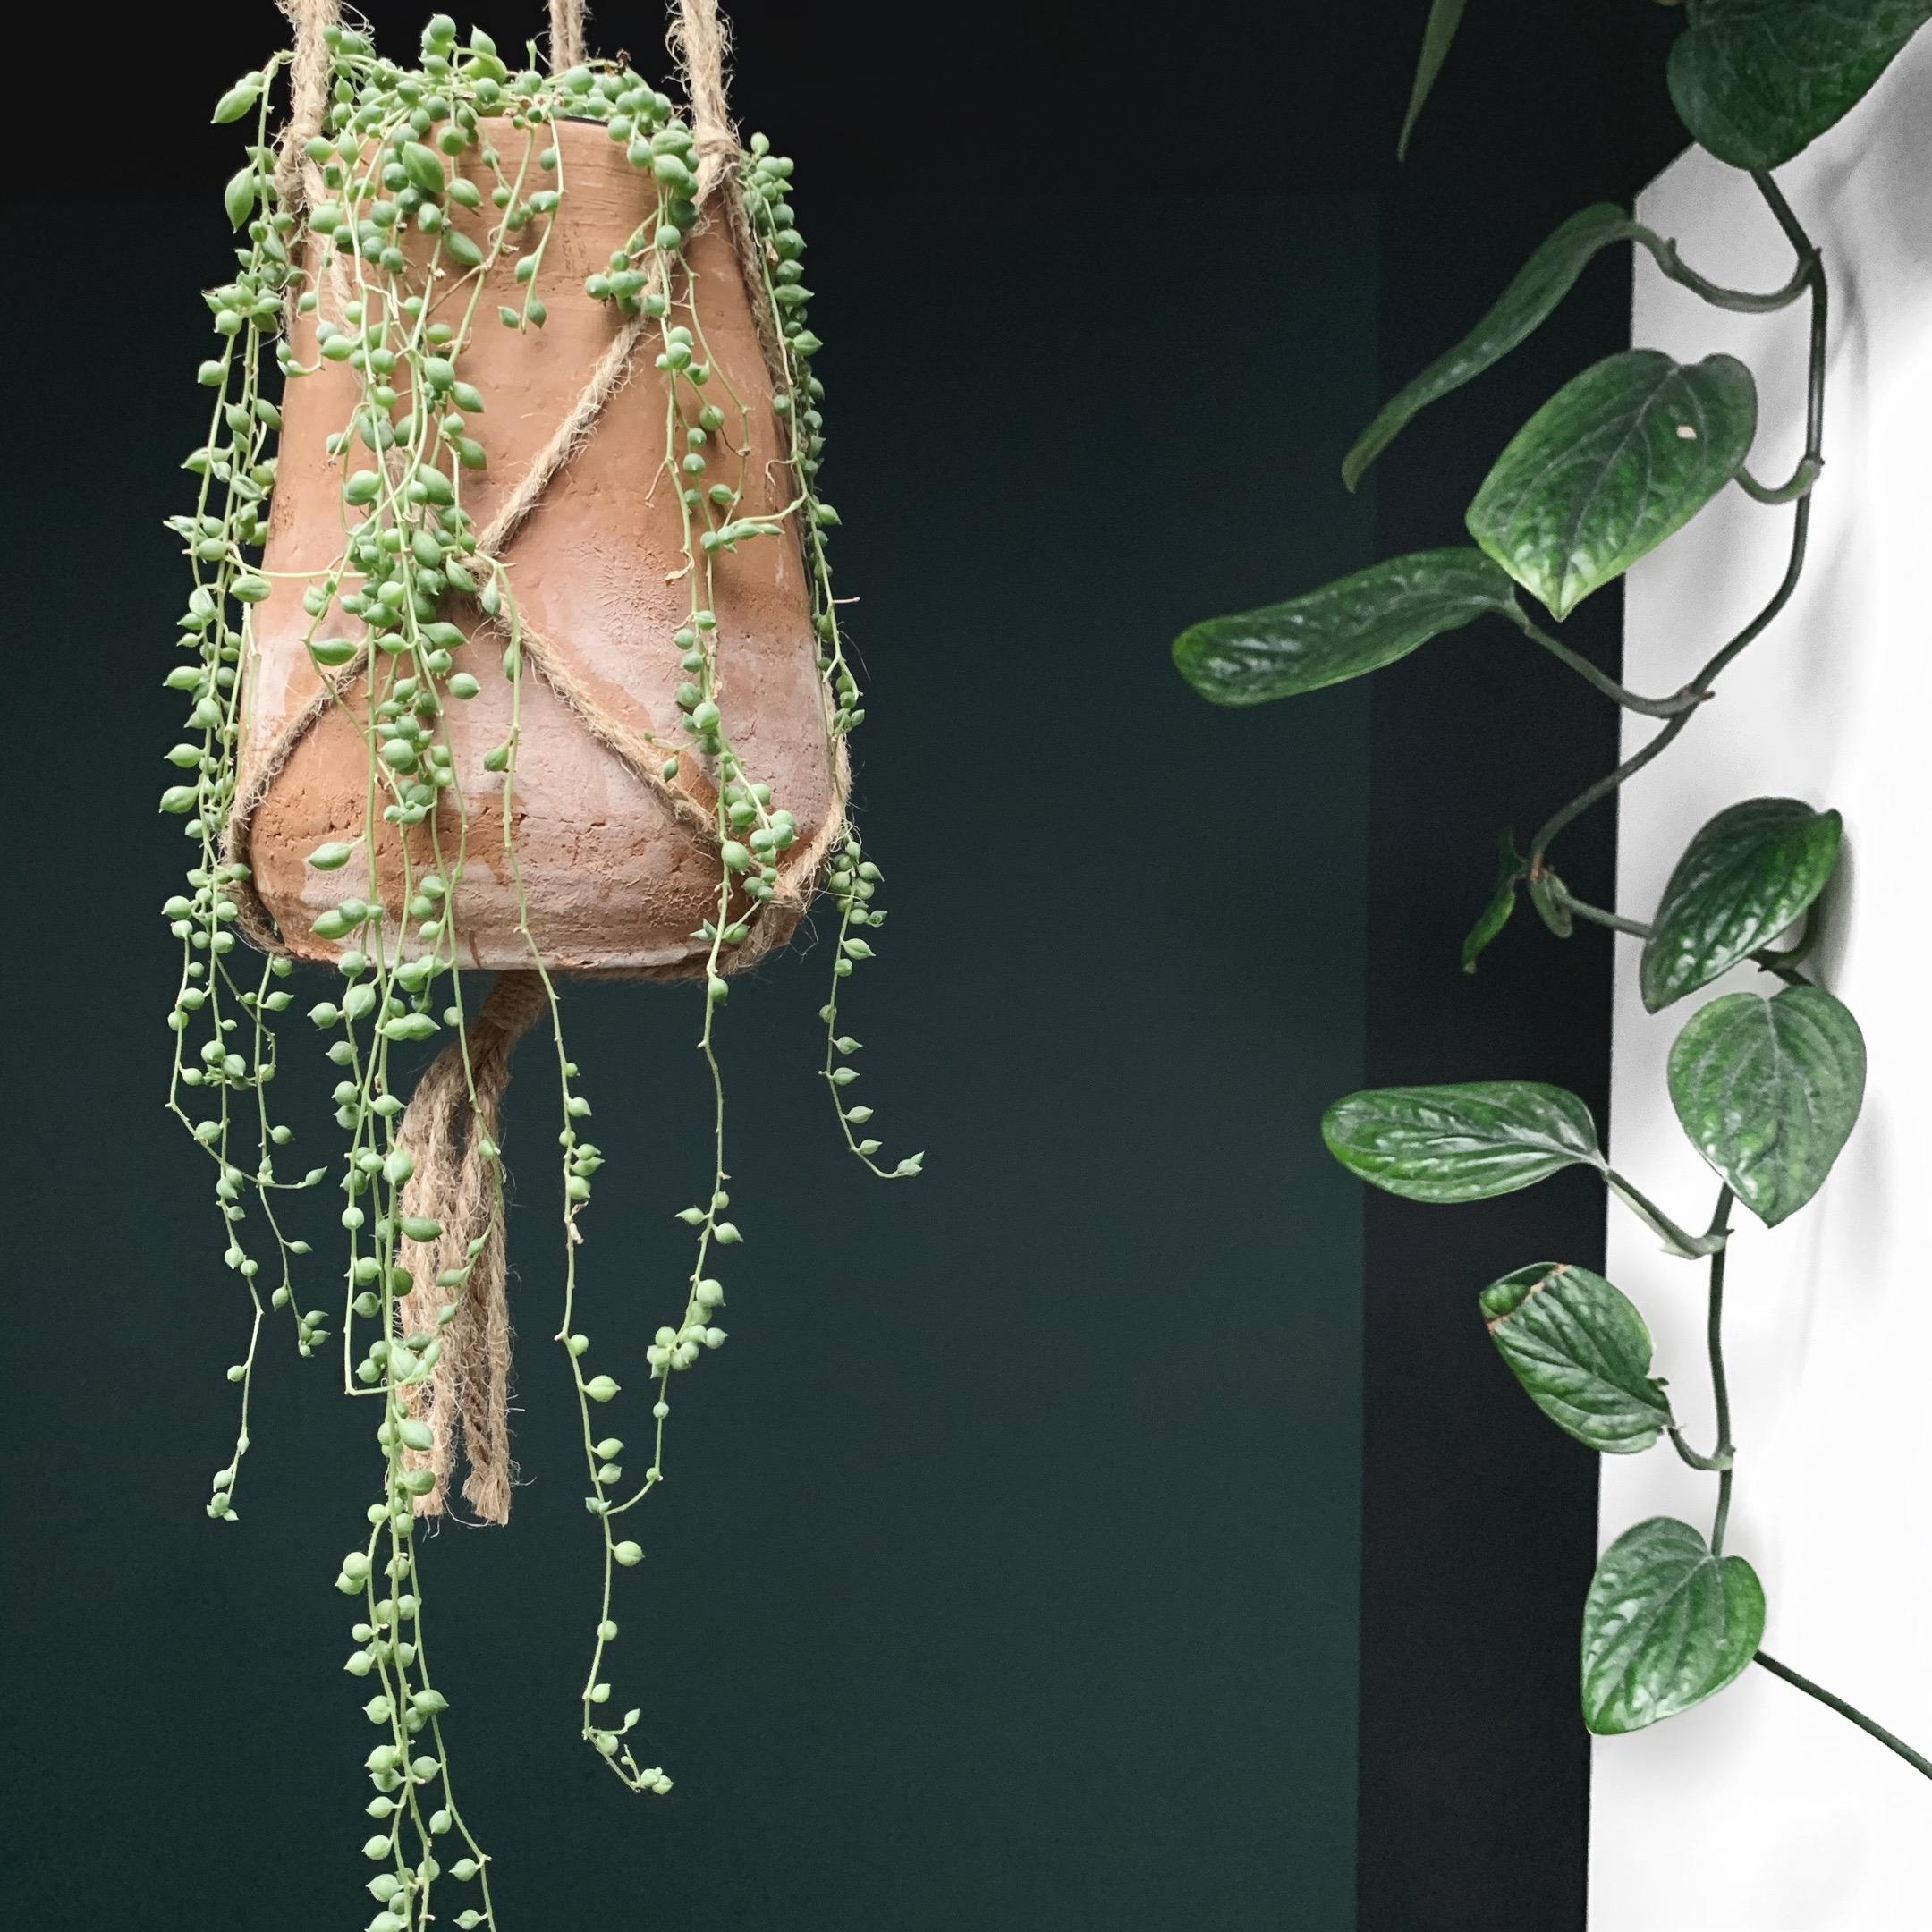 plant, planten, groen, huis, interieur, stijl, styling, meer groen, pot, binnenplant, gezellig